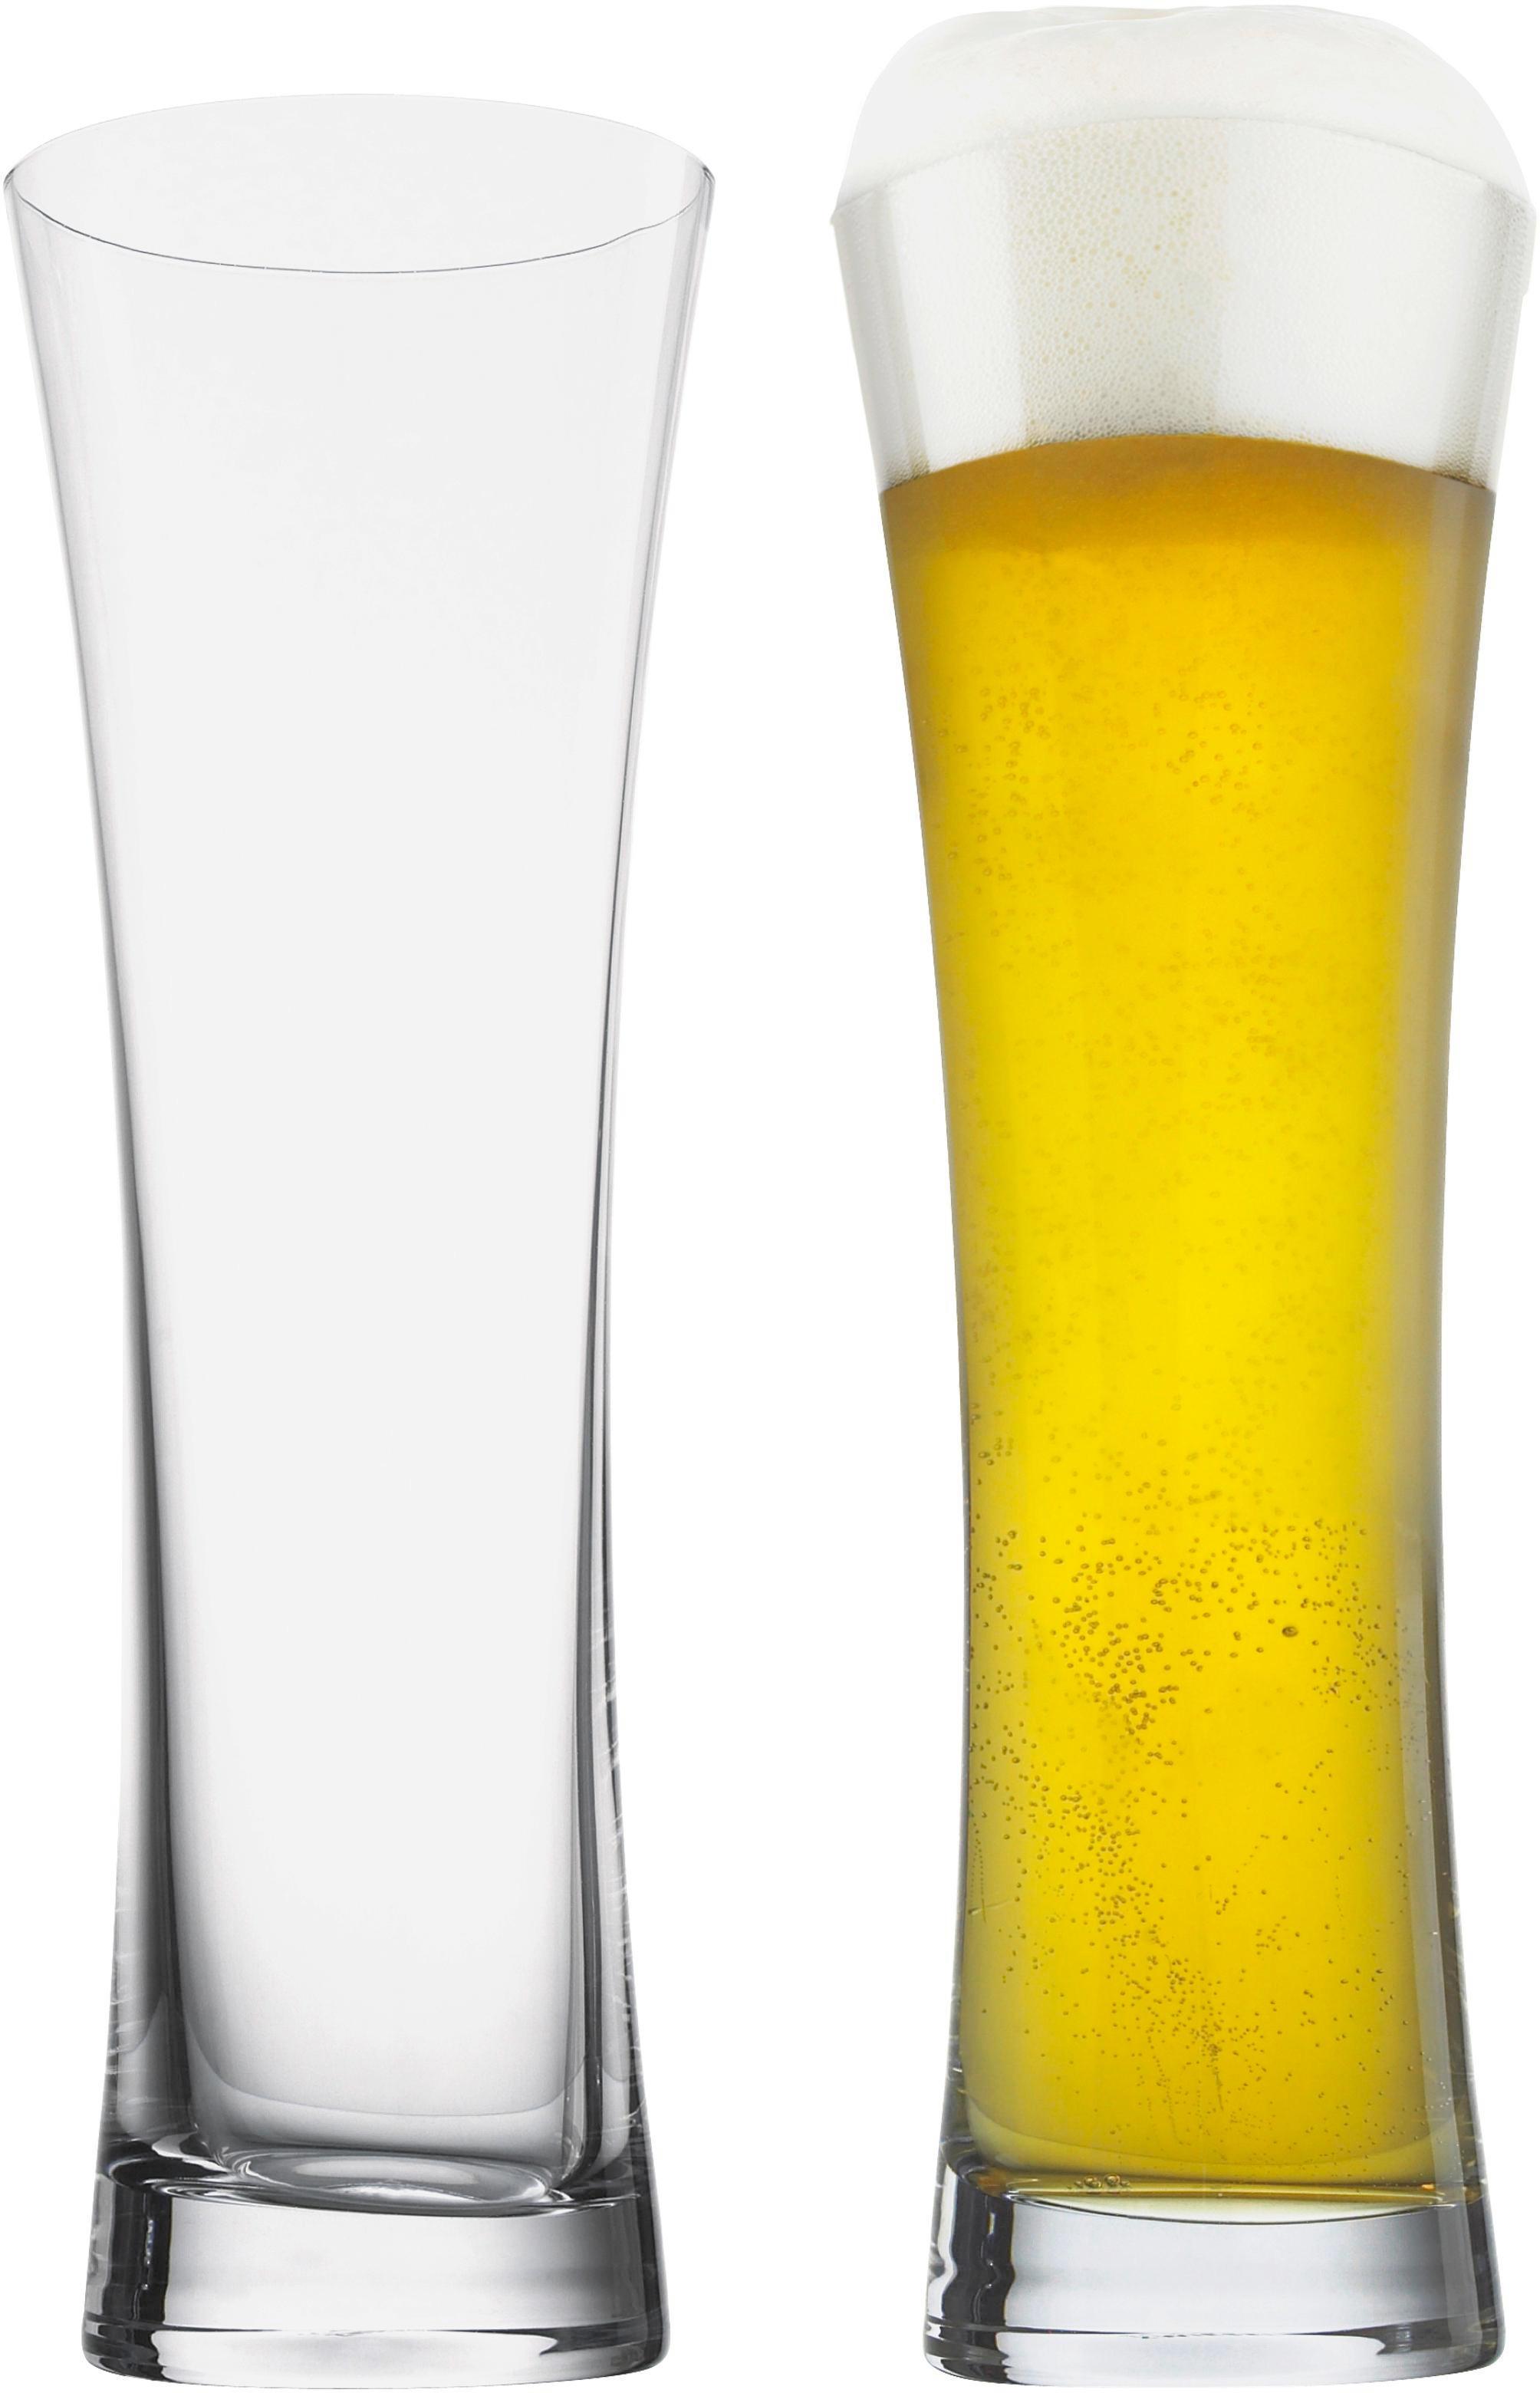 WEIZENBIERGLAS - Klar, Basics, Glas (31,1/21,1/26,5cm) - SCHOTT ZWIESEL